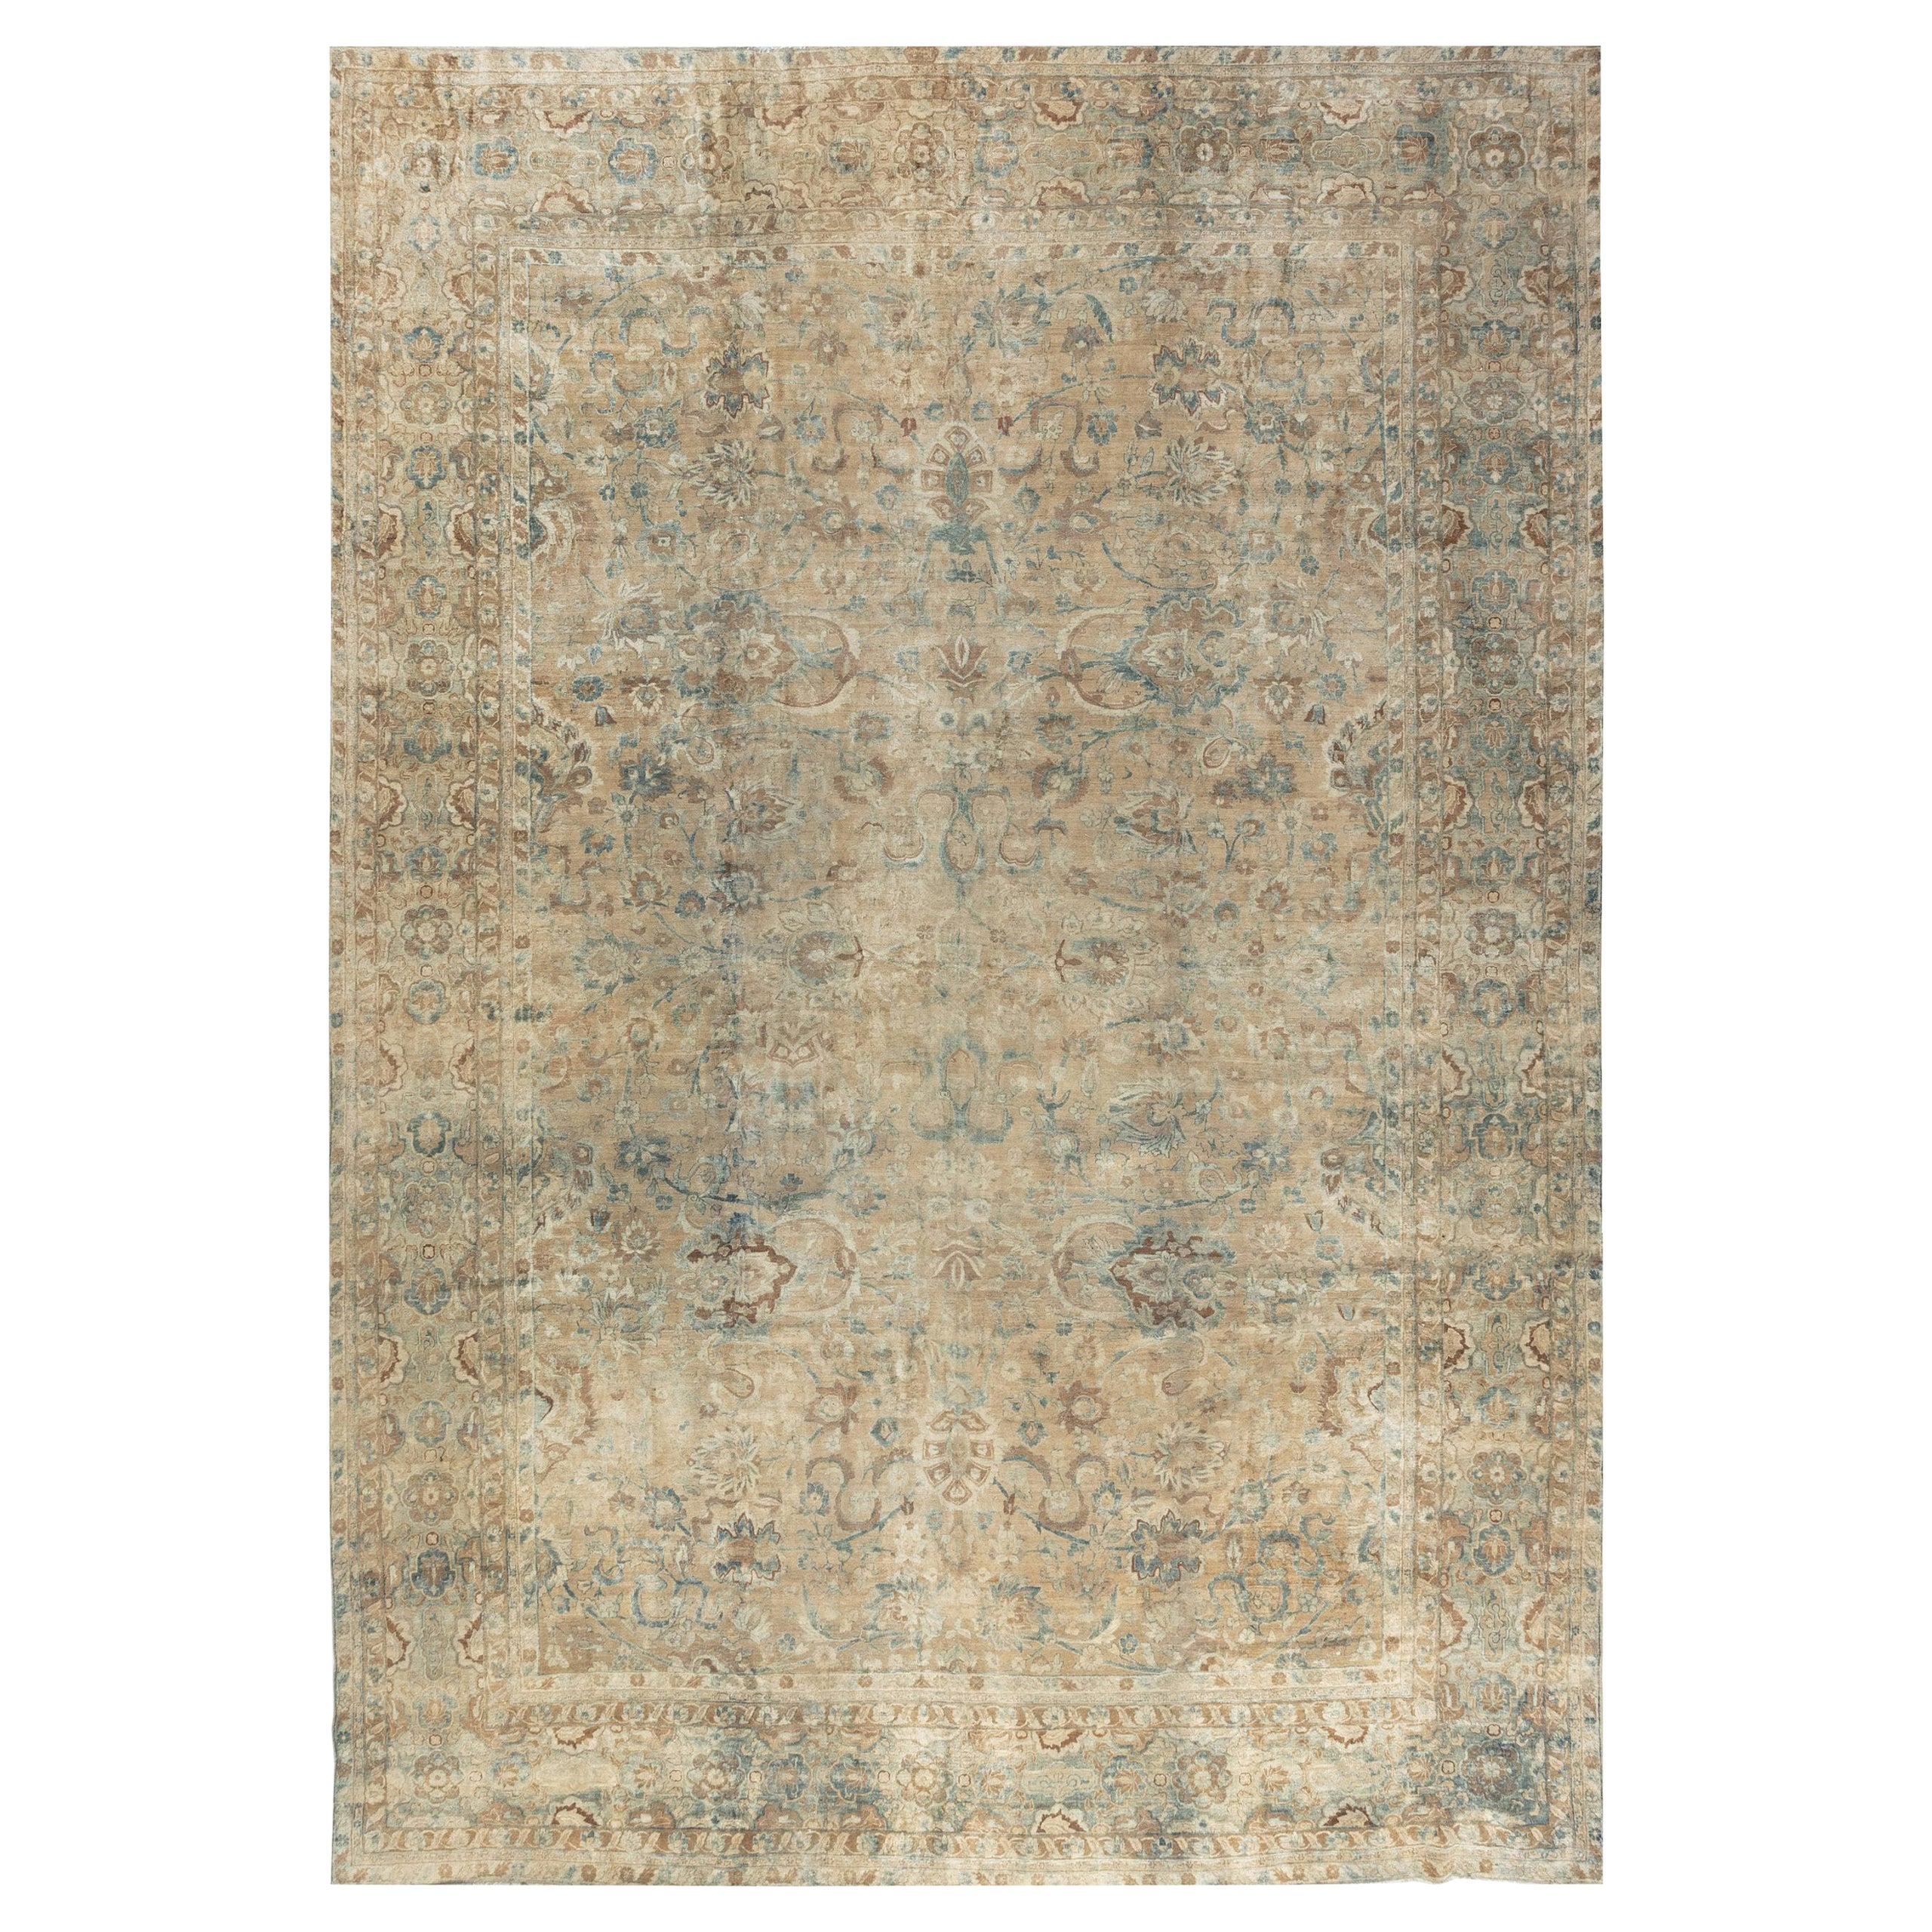 Antique Persian Kirman Ivory, Blue and Magenta Handwoven Wool Carpet